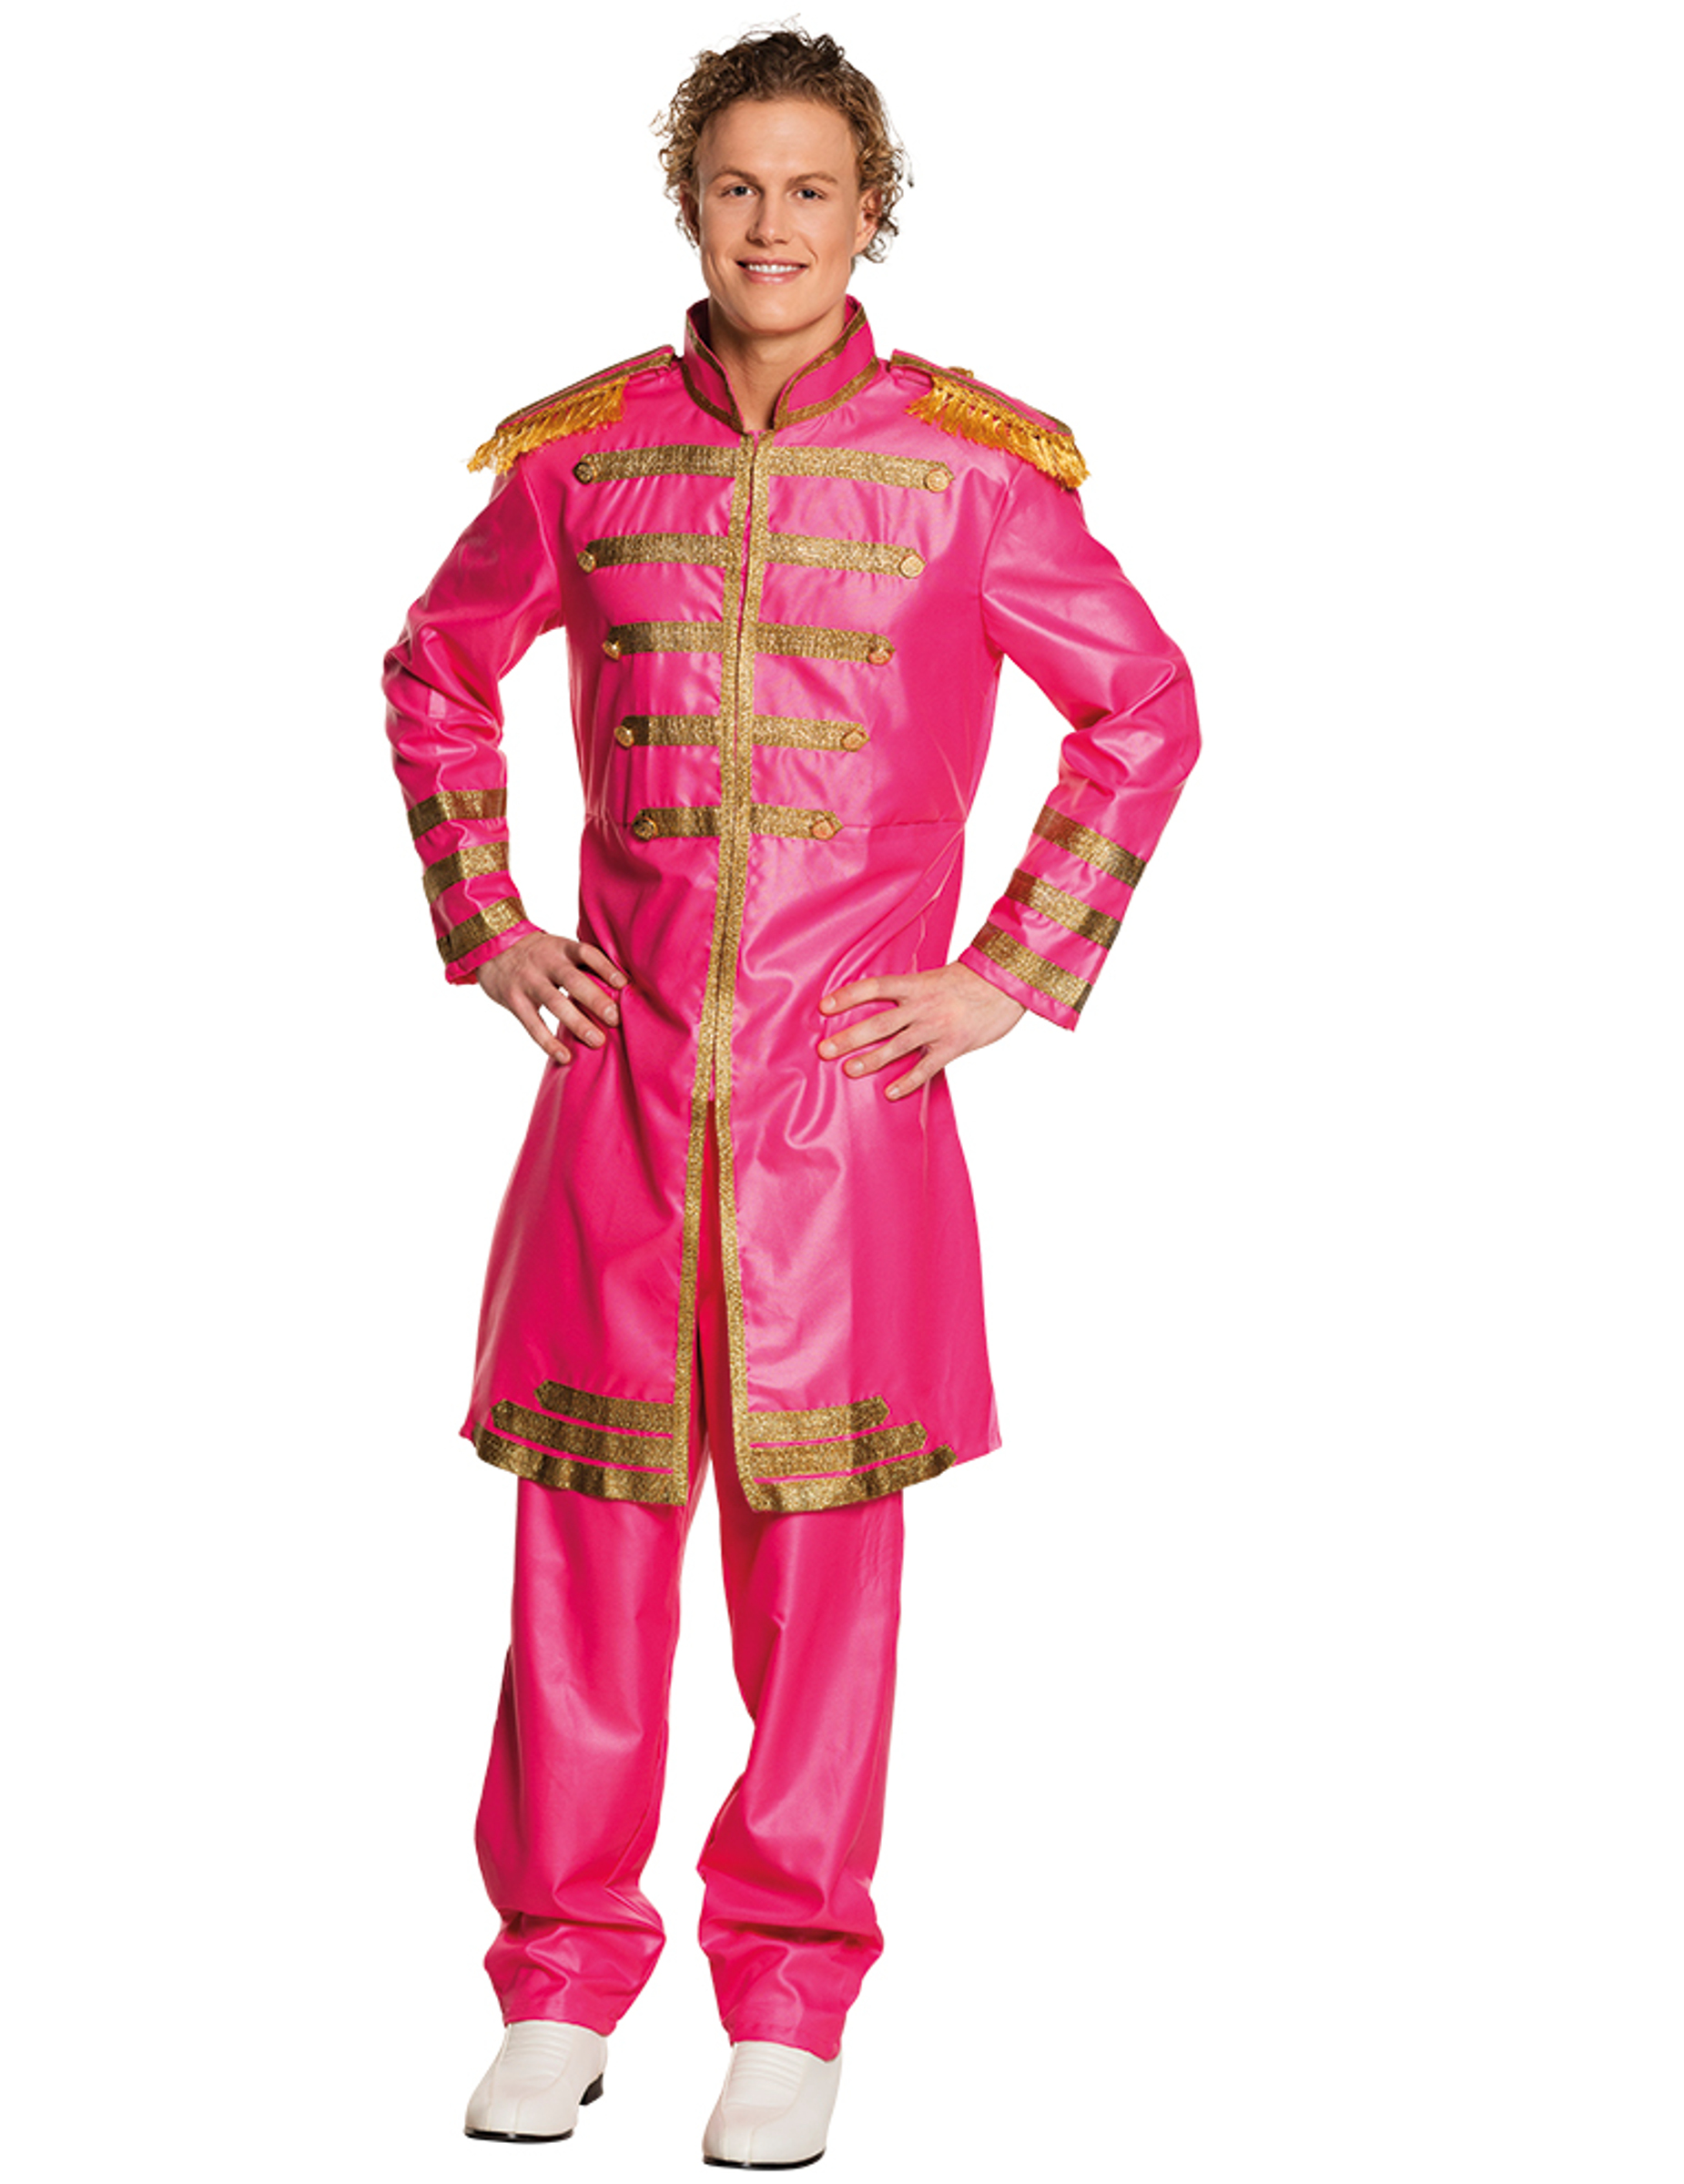 pop s nger 80er jahre kost m f r herren pink gold kost me f r erwachsene und g nstige. Black Bedroom Furniture Sets. Home Design Ideas